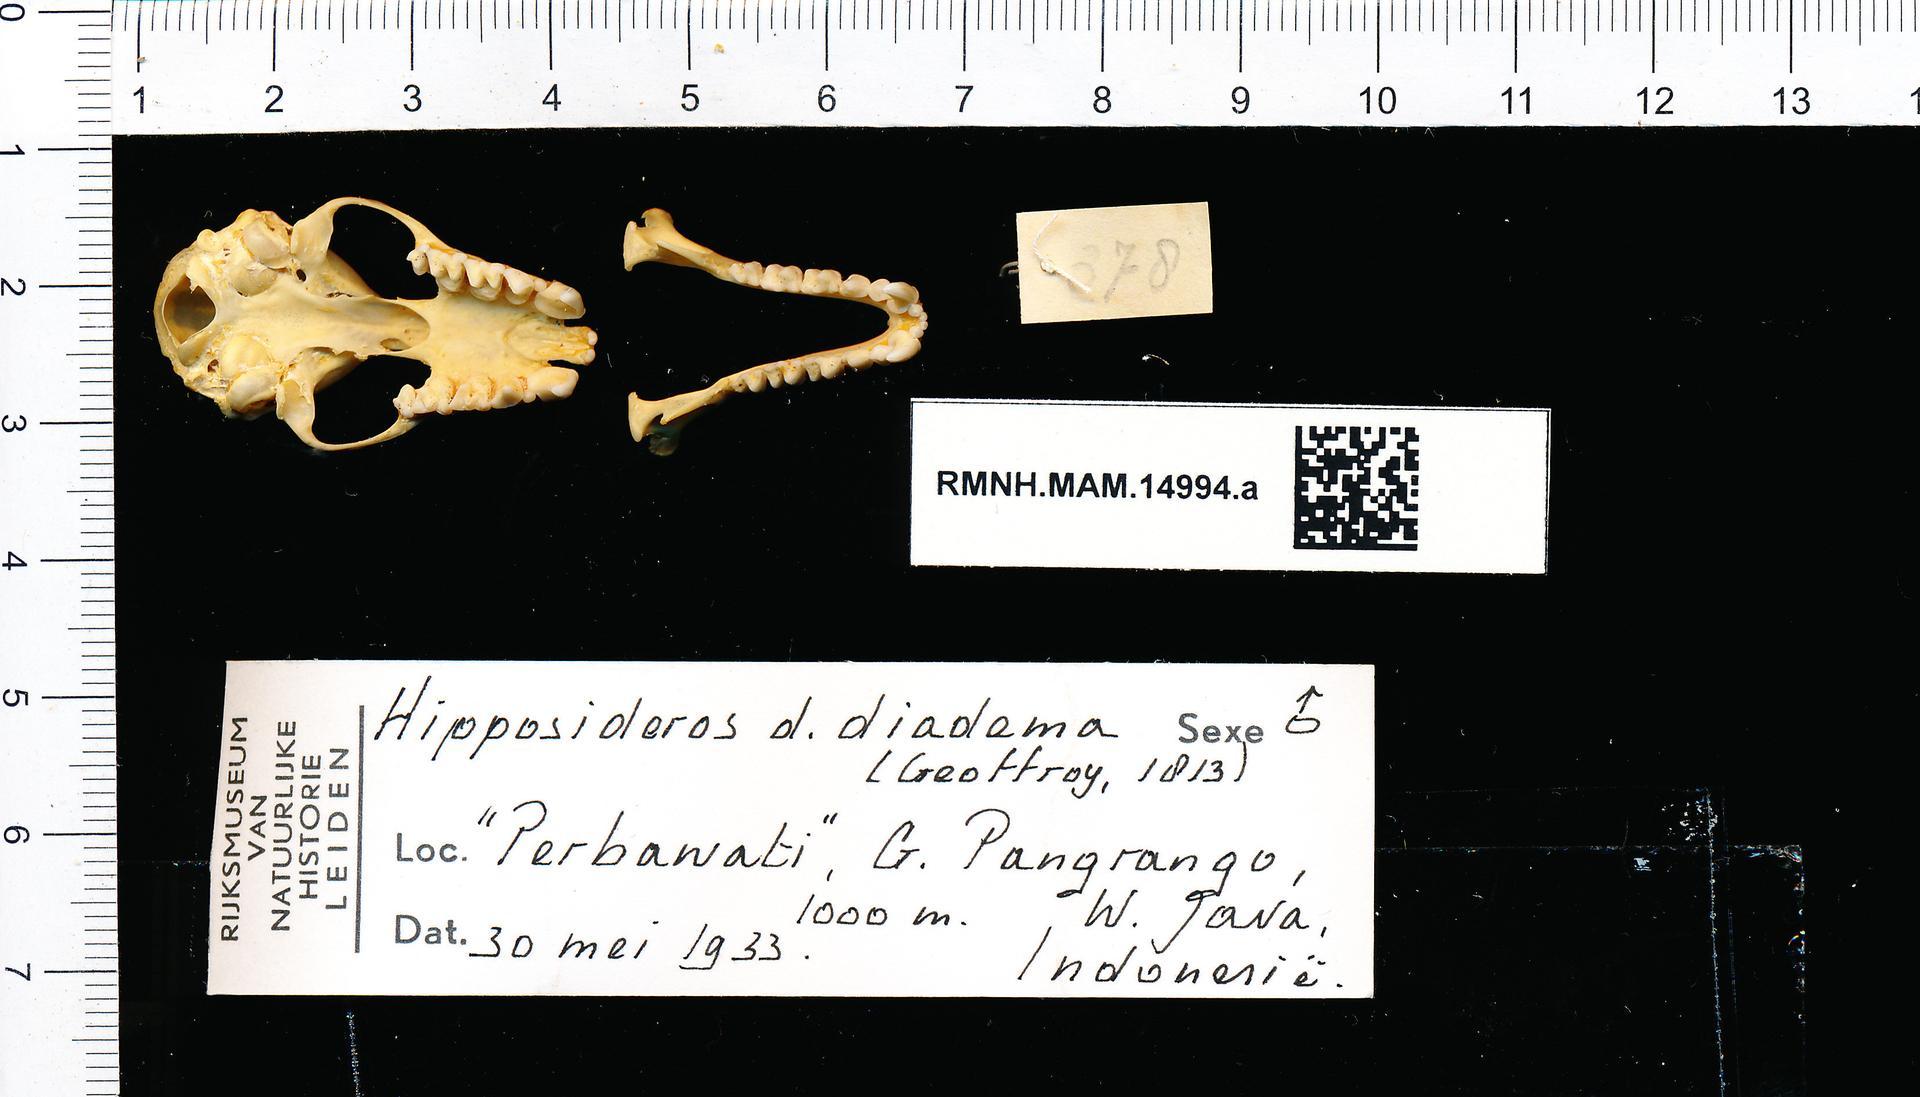 File:Naturalis Biodiversity Center - RMNH.MAM.14994.a pal - Hipposideros  Diadema Diadema - skull.jpeg - Wikimedia Commons